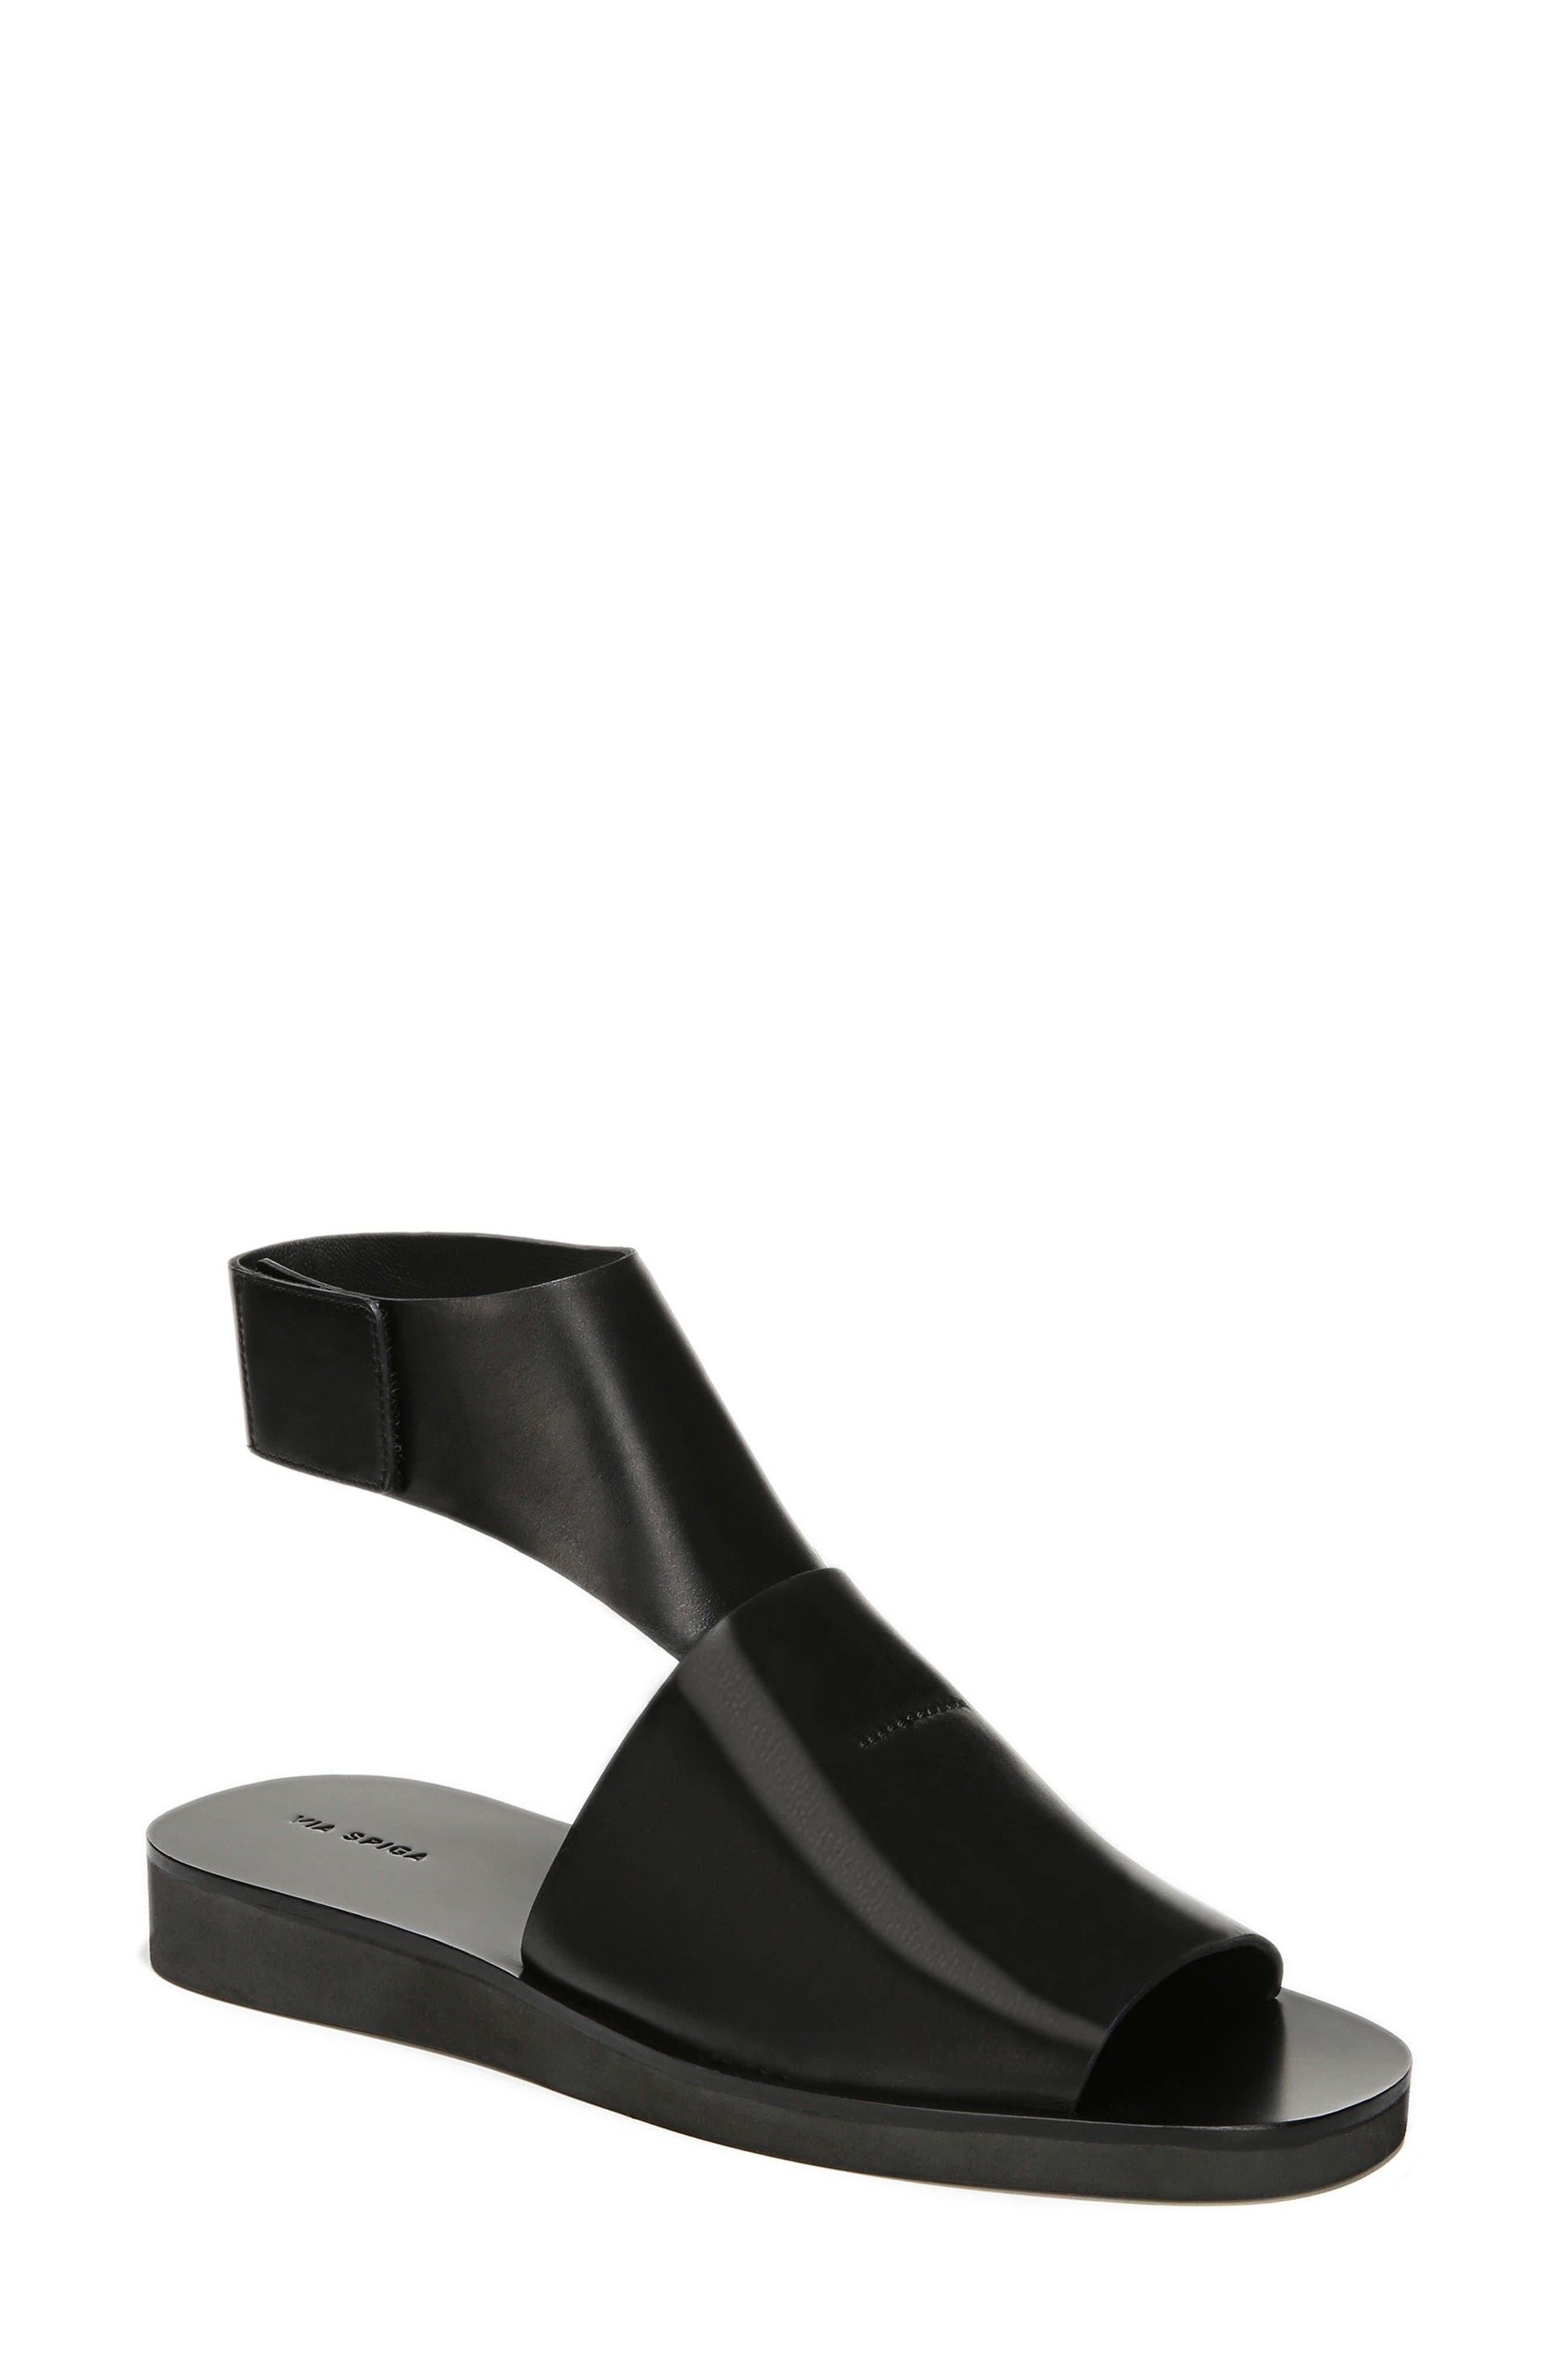 Briar Ankle Strap Sandal,                             Main thumbnail 1, color,                             001